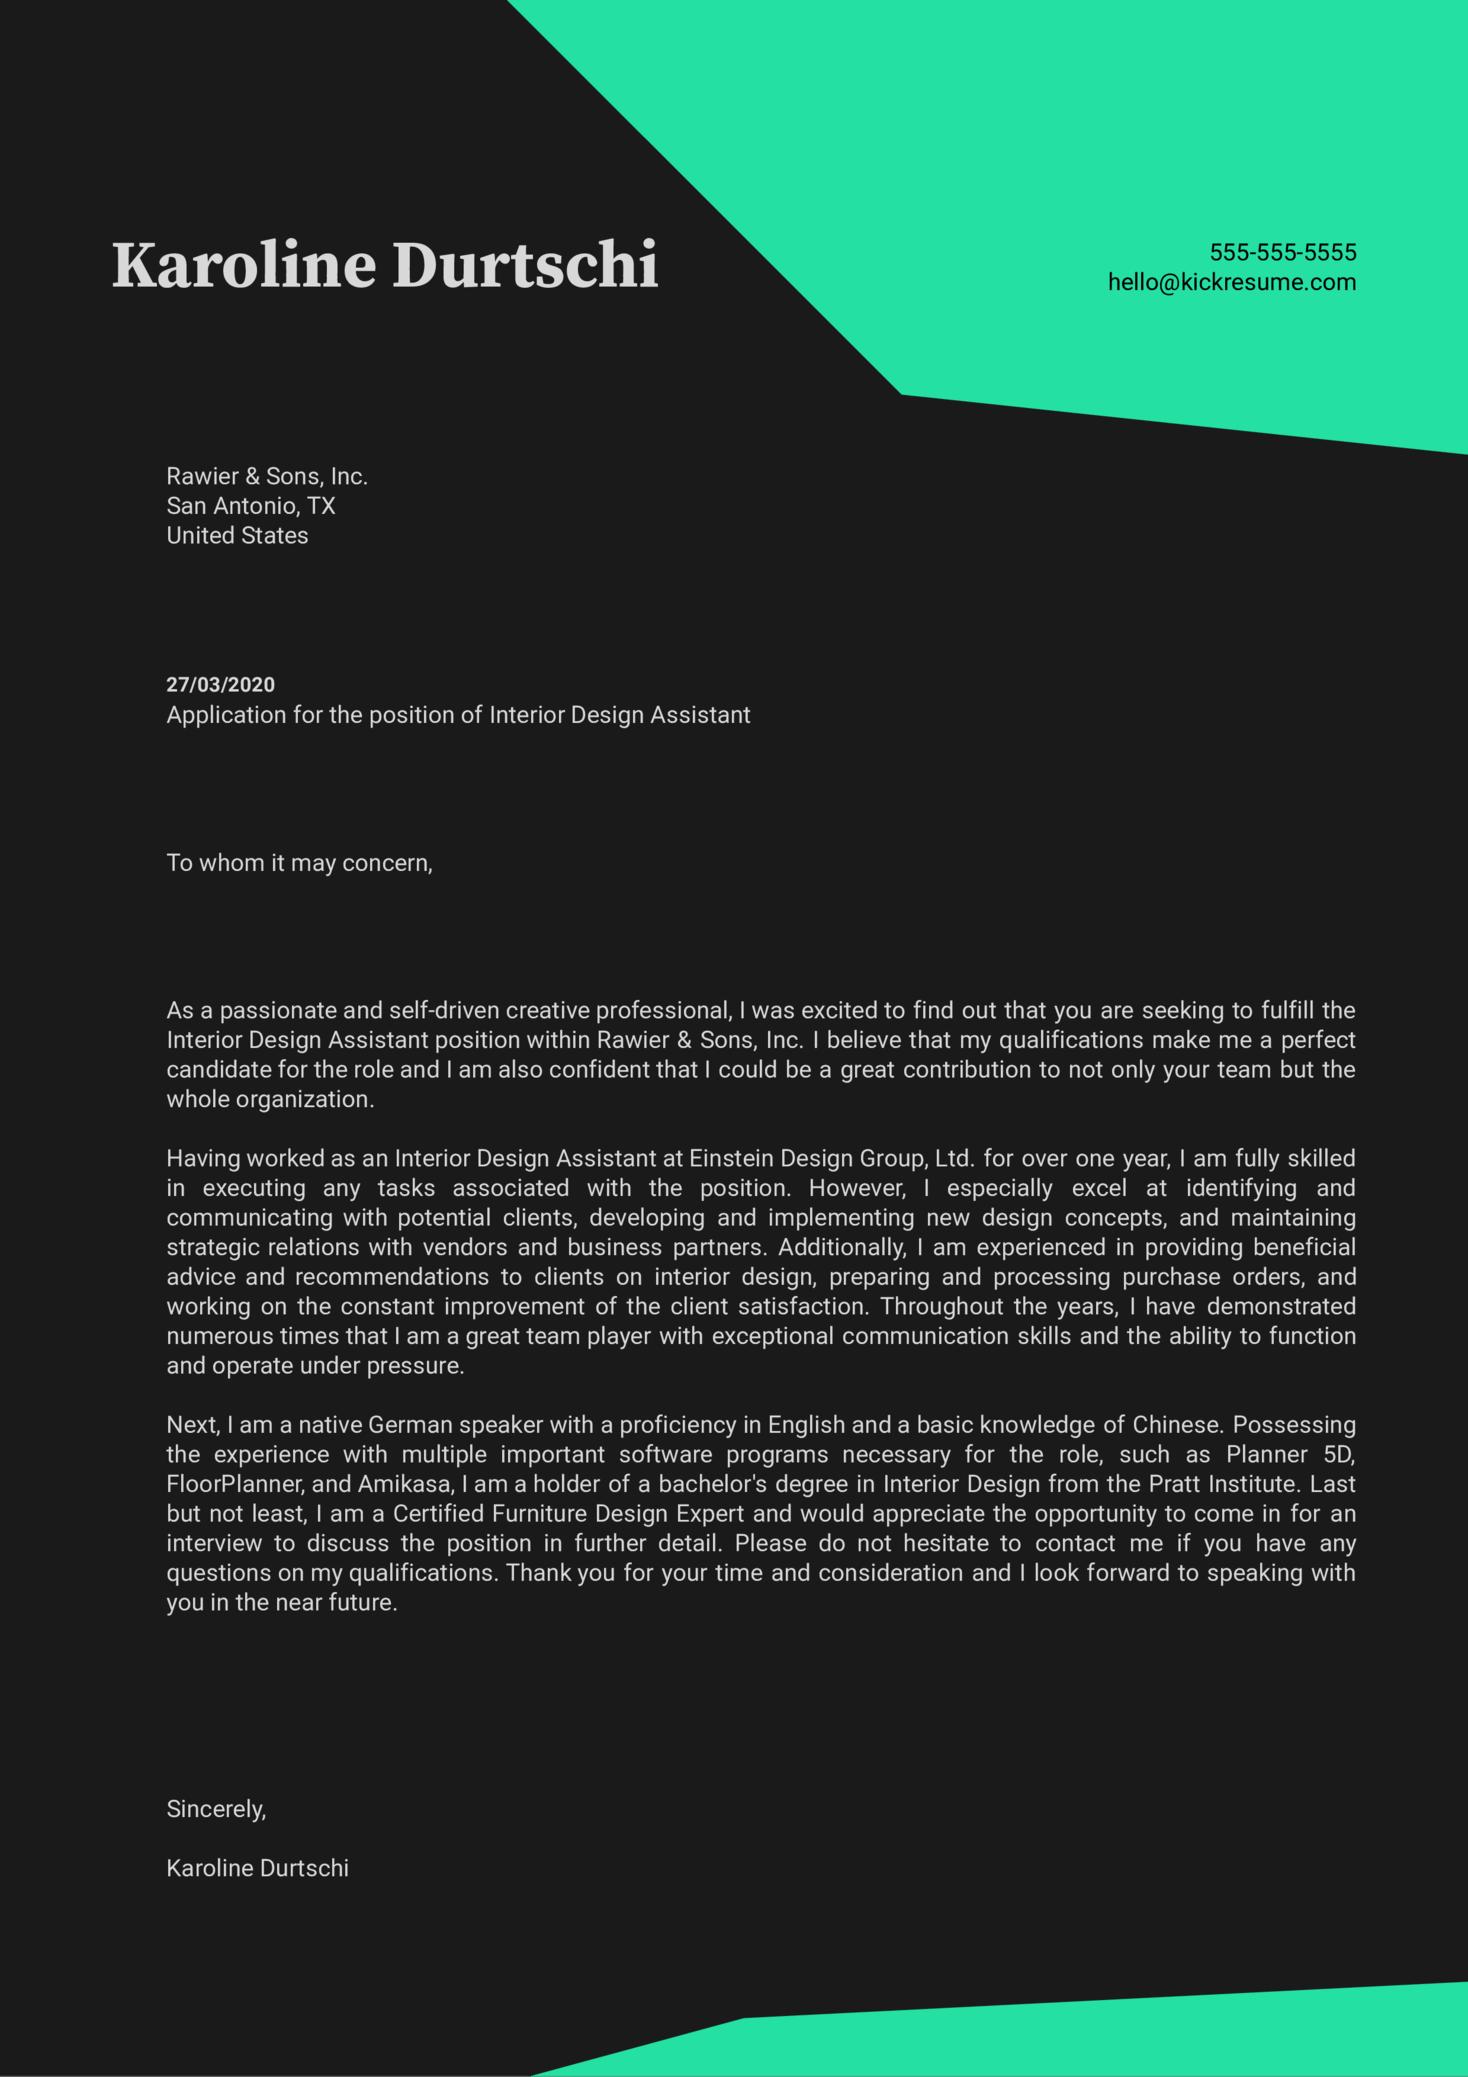 Interior Design Assistant Cover Letter Sample